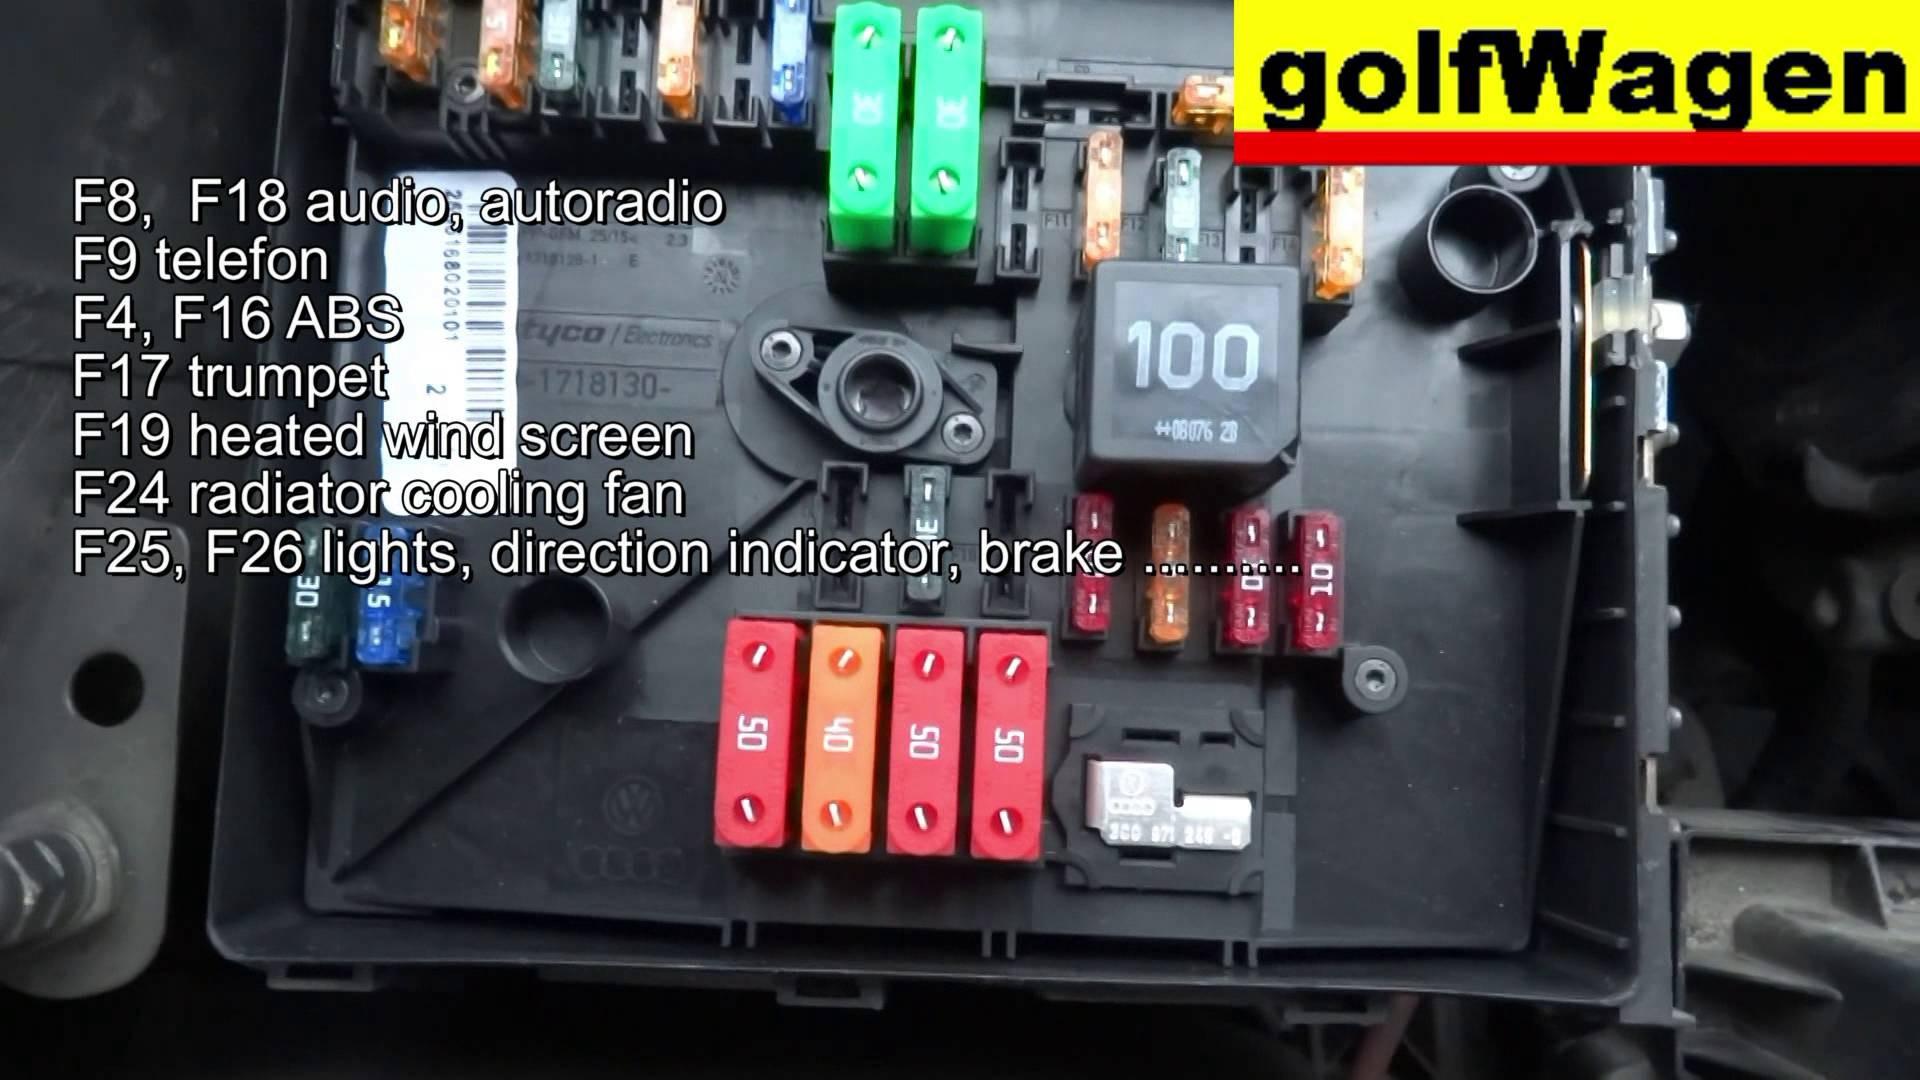 2001 Vw Passat Engine Diagram Vw Golf 5 Fuse Location and Fuse Diagram  Engine Fuse too